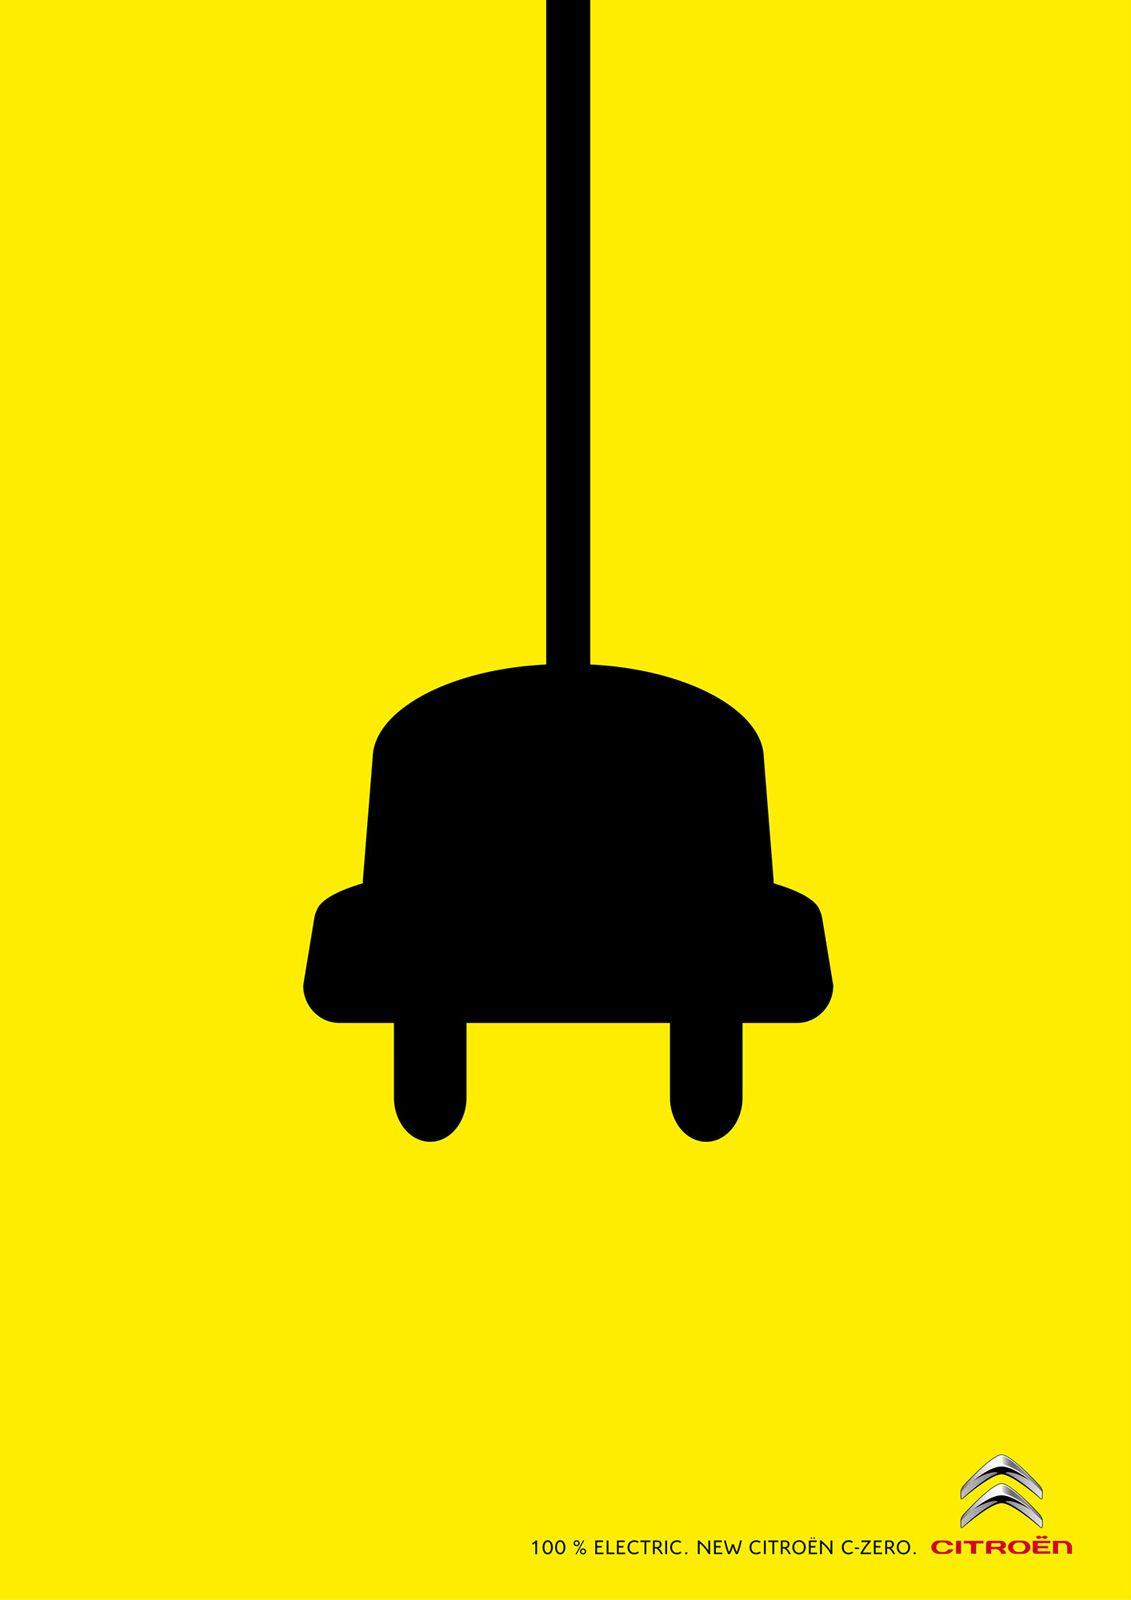 Citroen C Zero Electric Car Graphic Design Art Poster Art